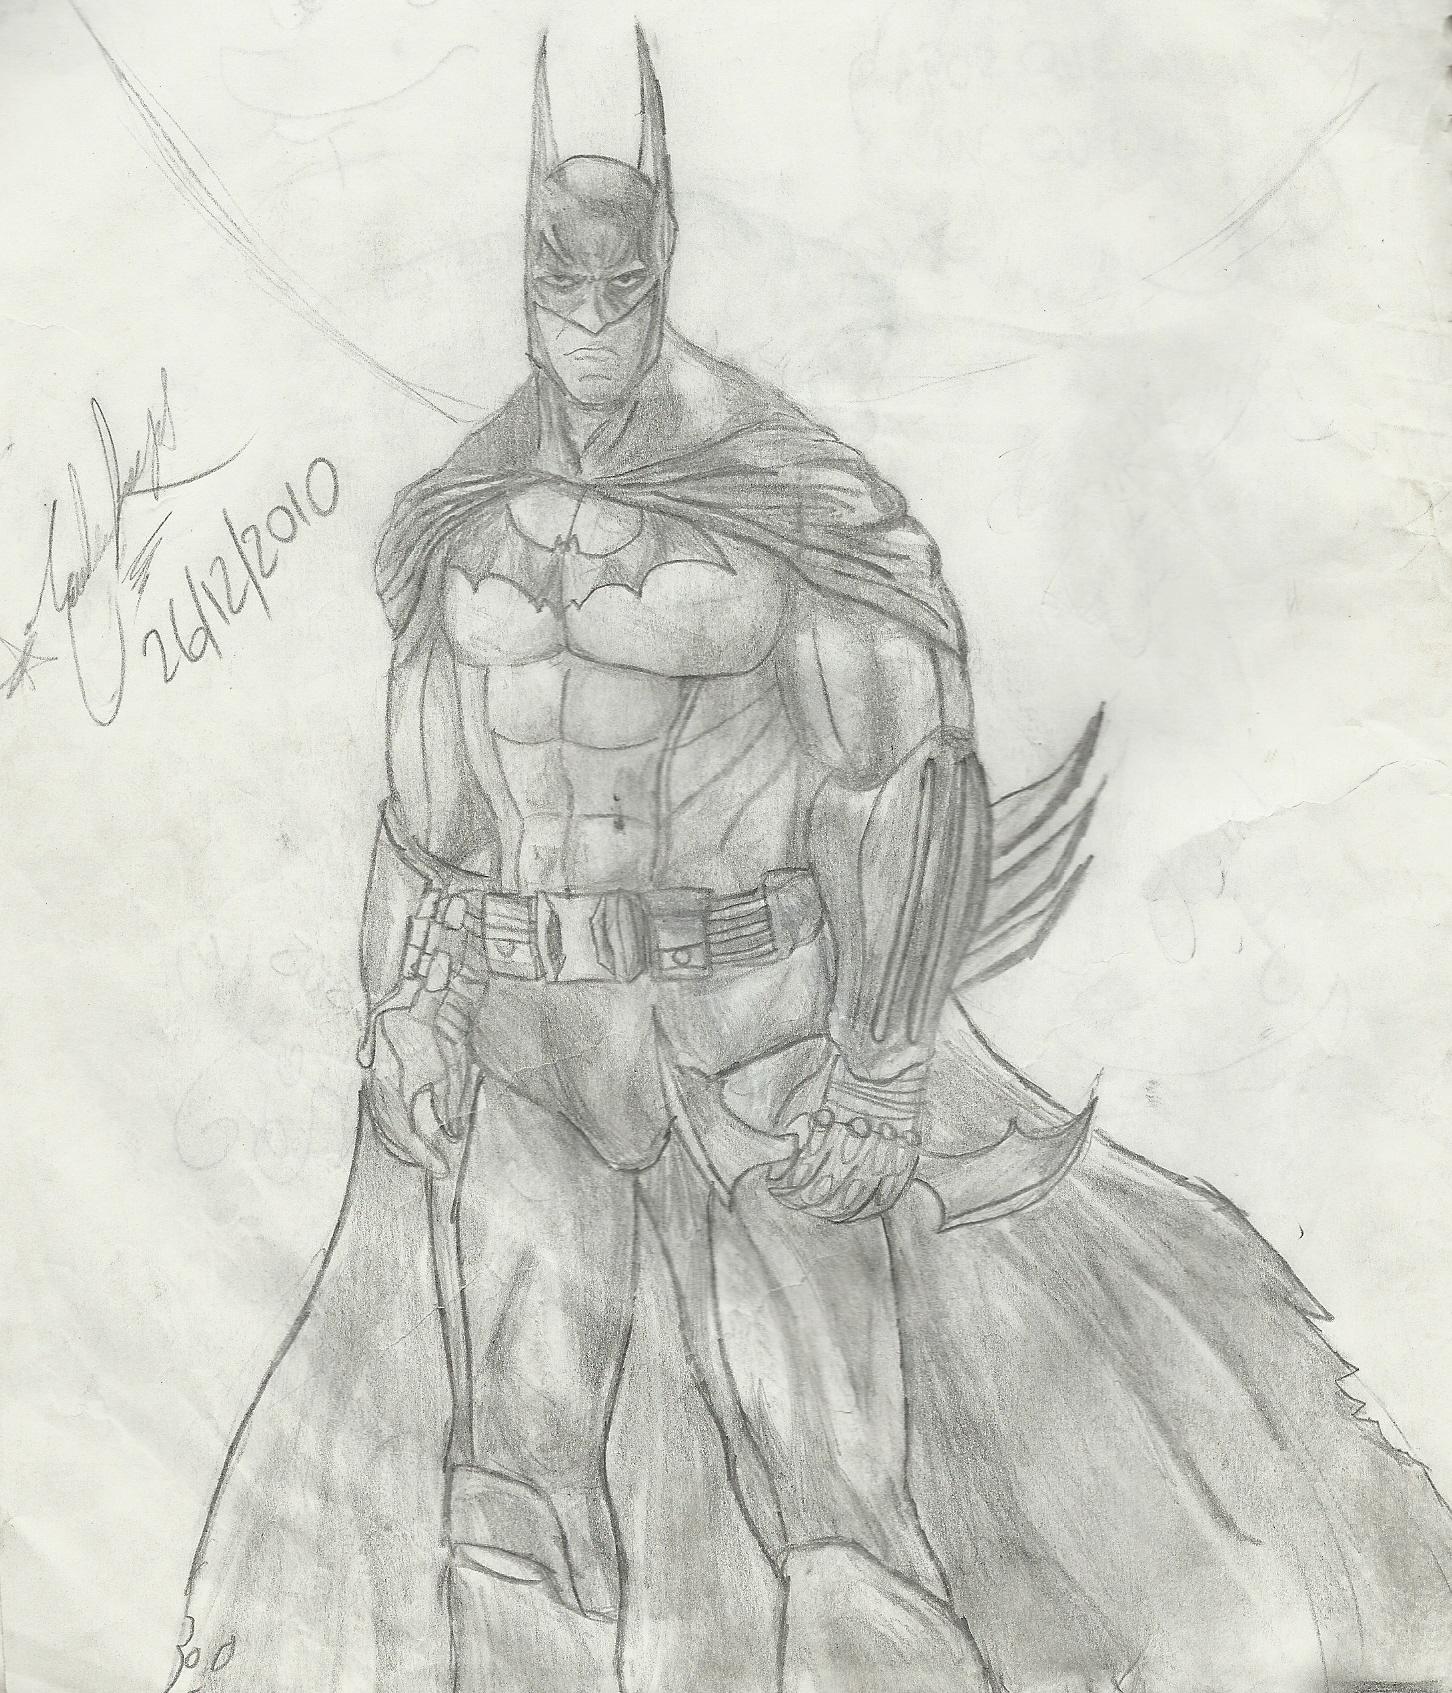 Batman Arkaham Ayslum